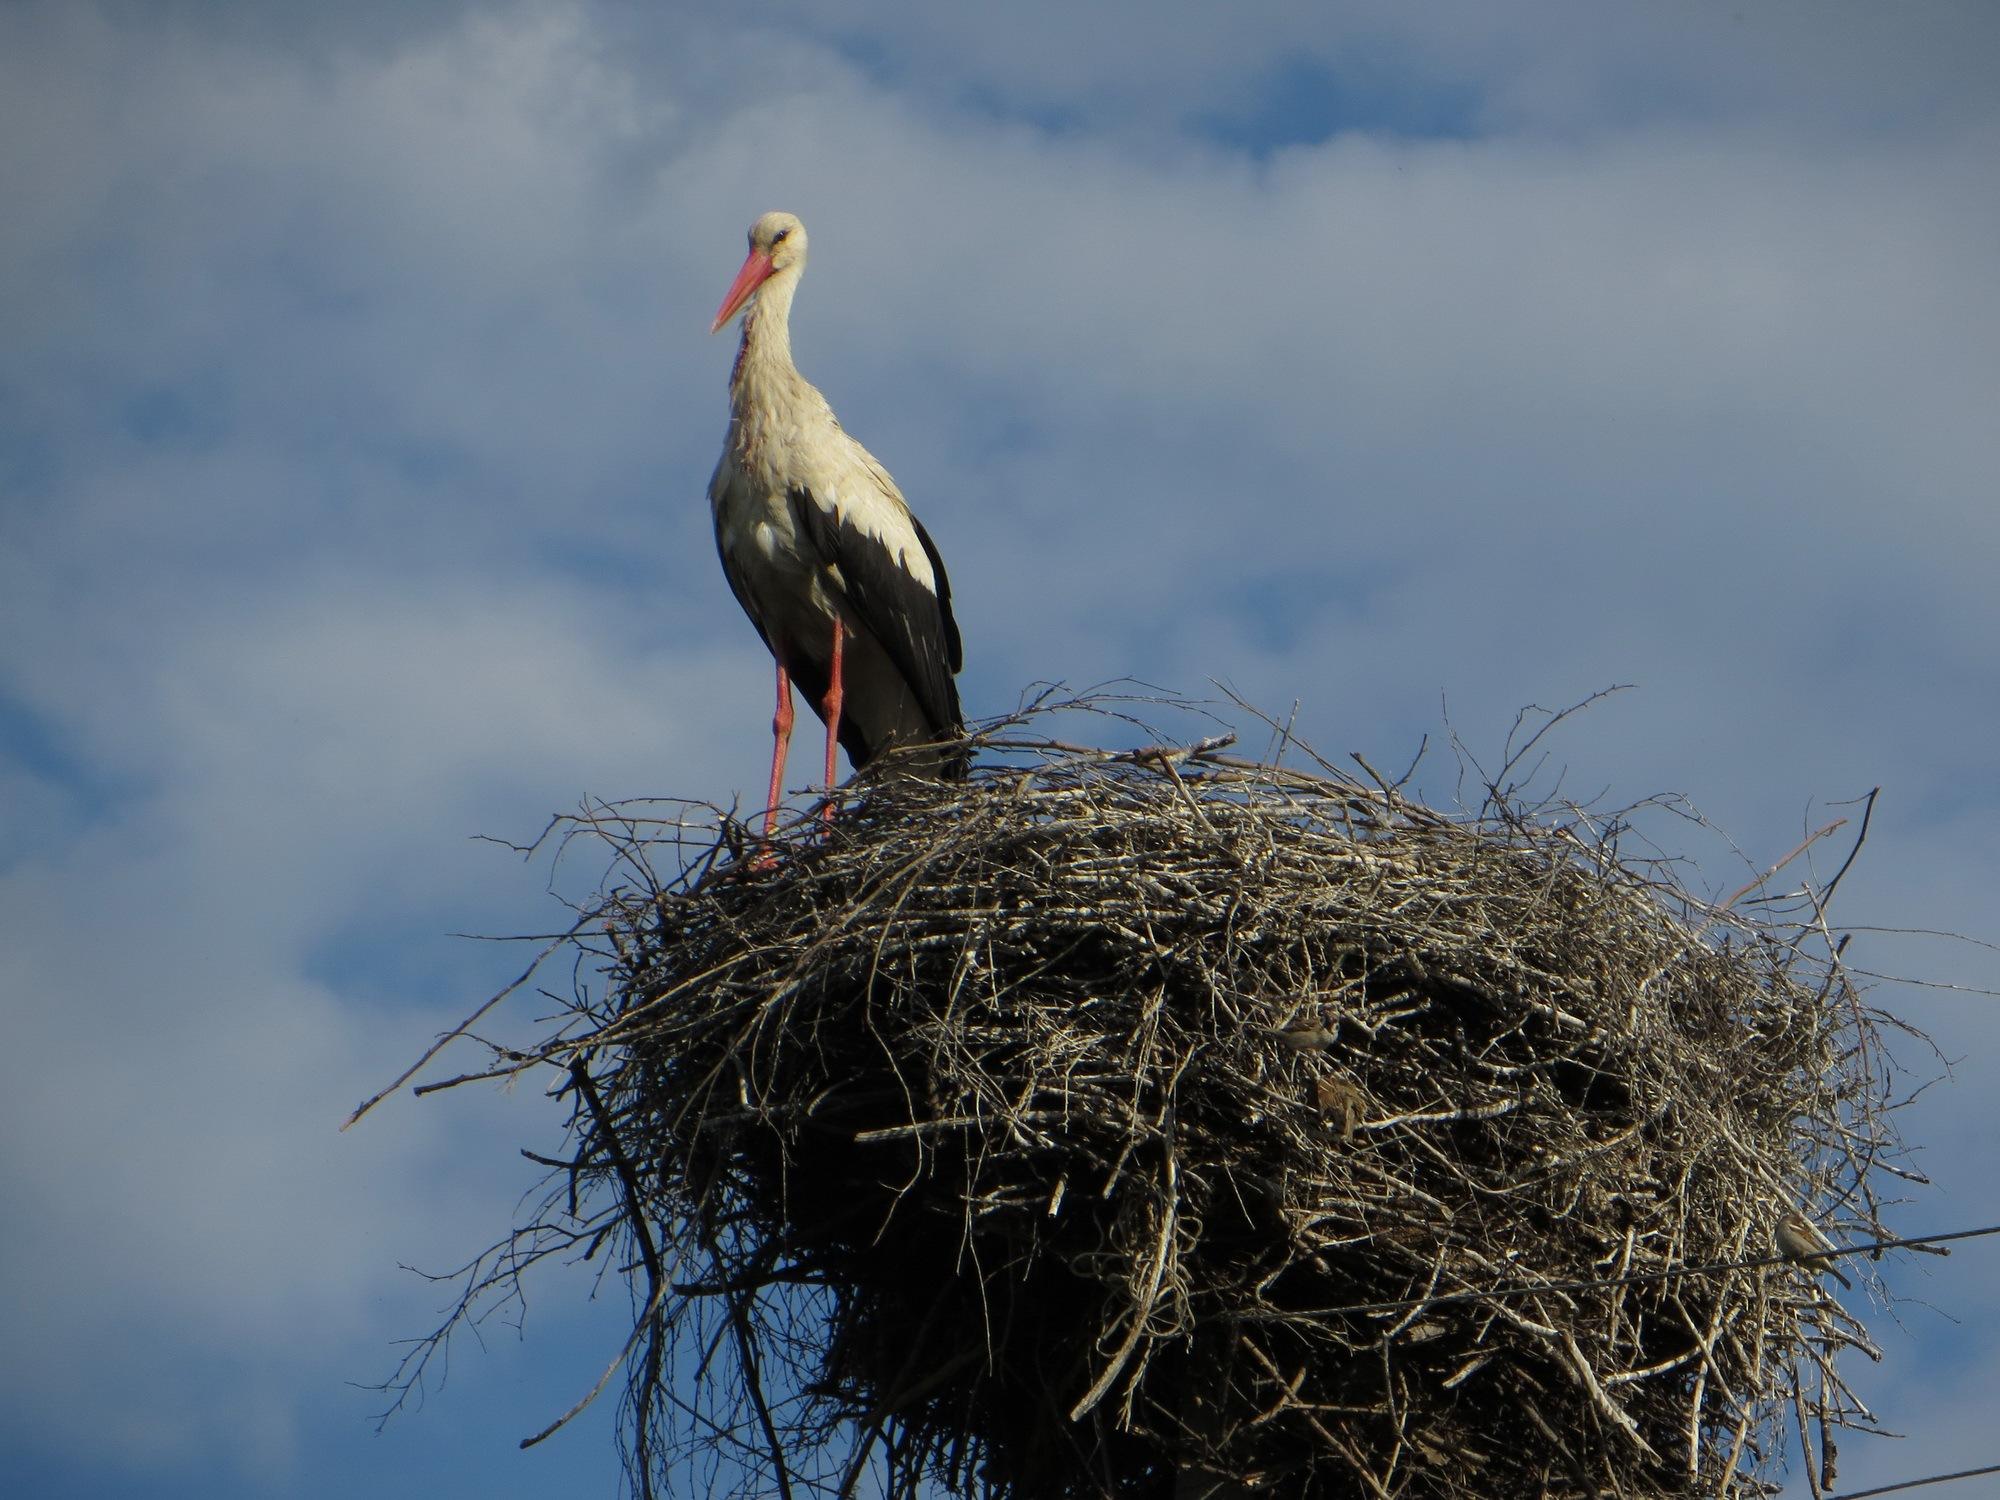 Stork by Yurkoff Wladimir